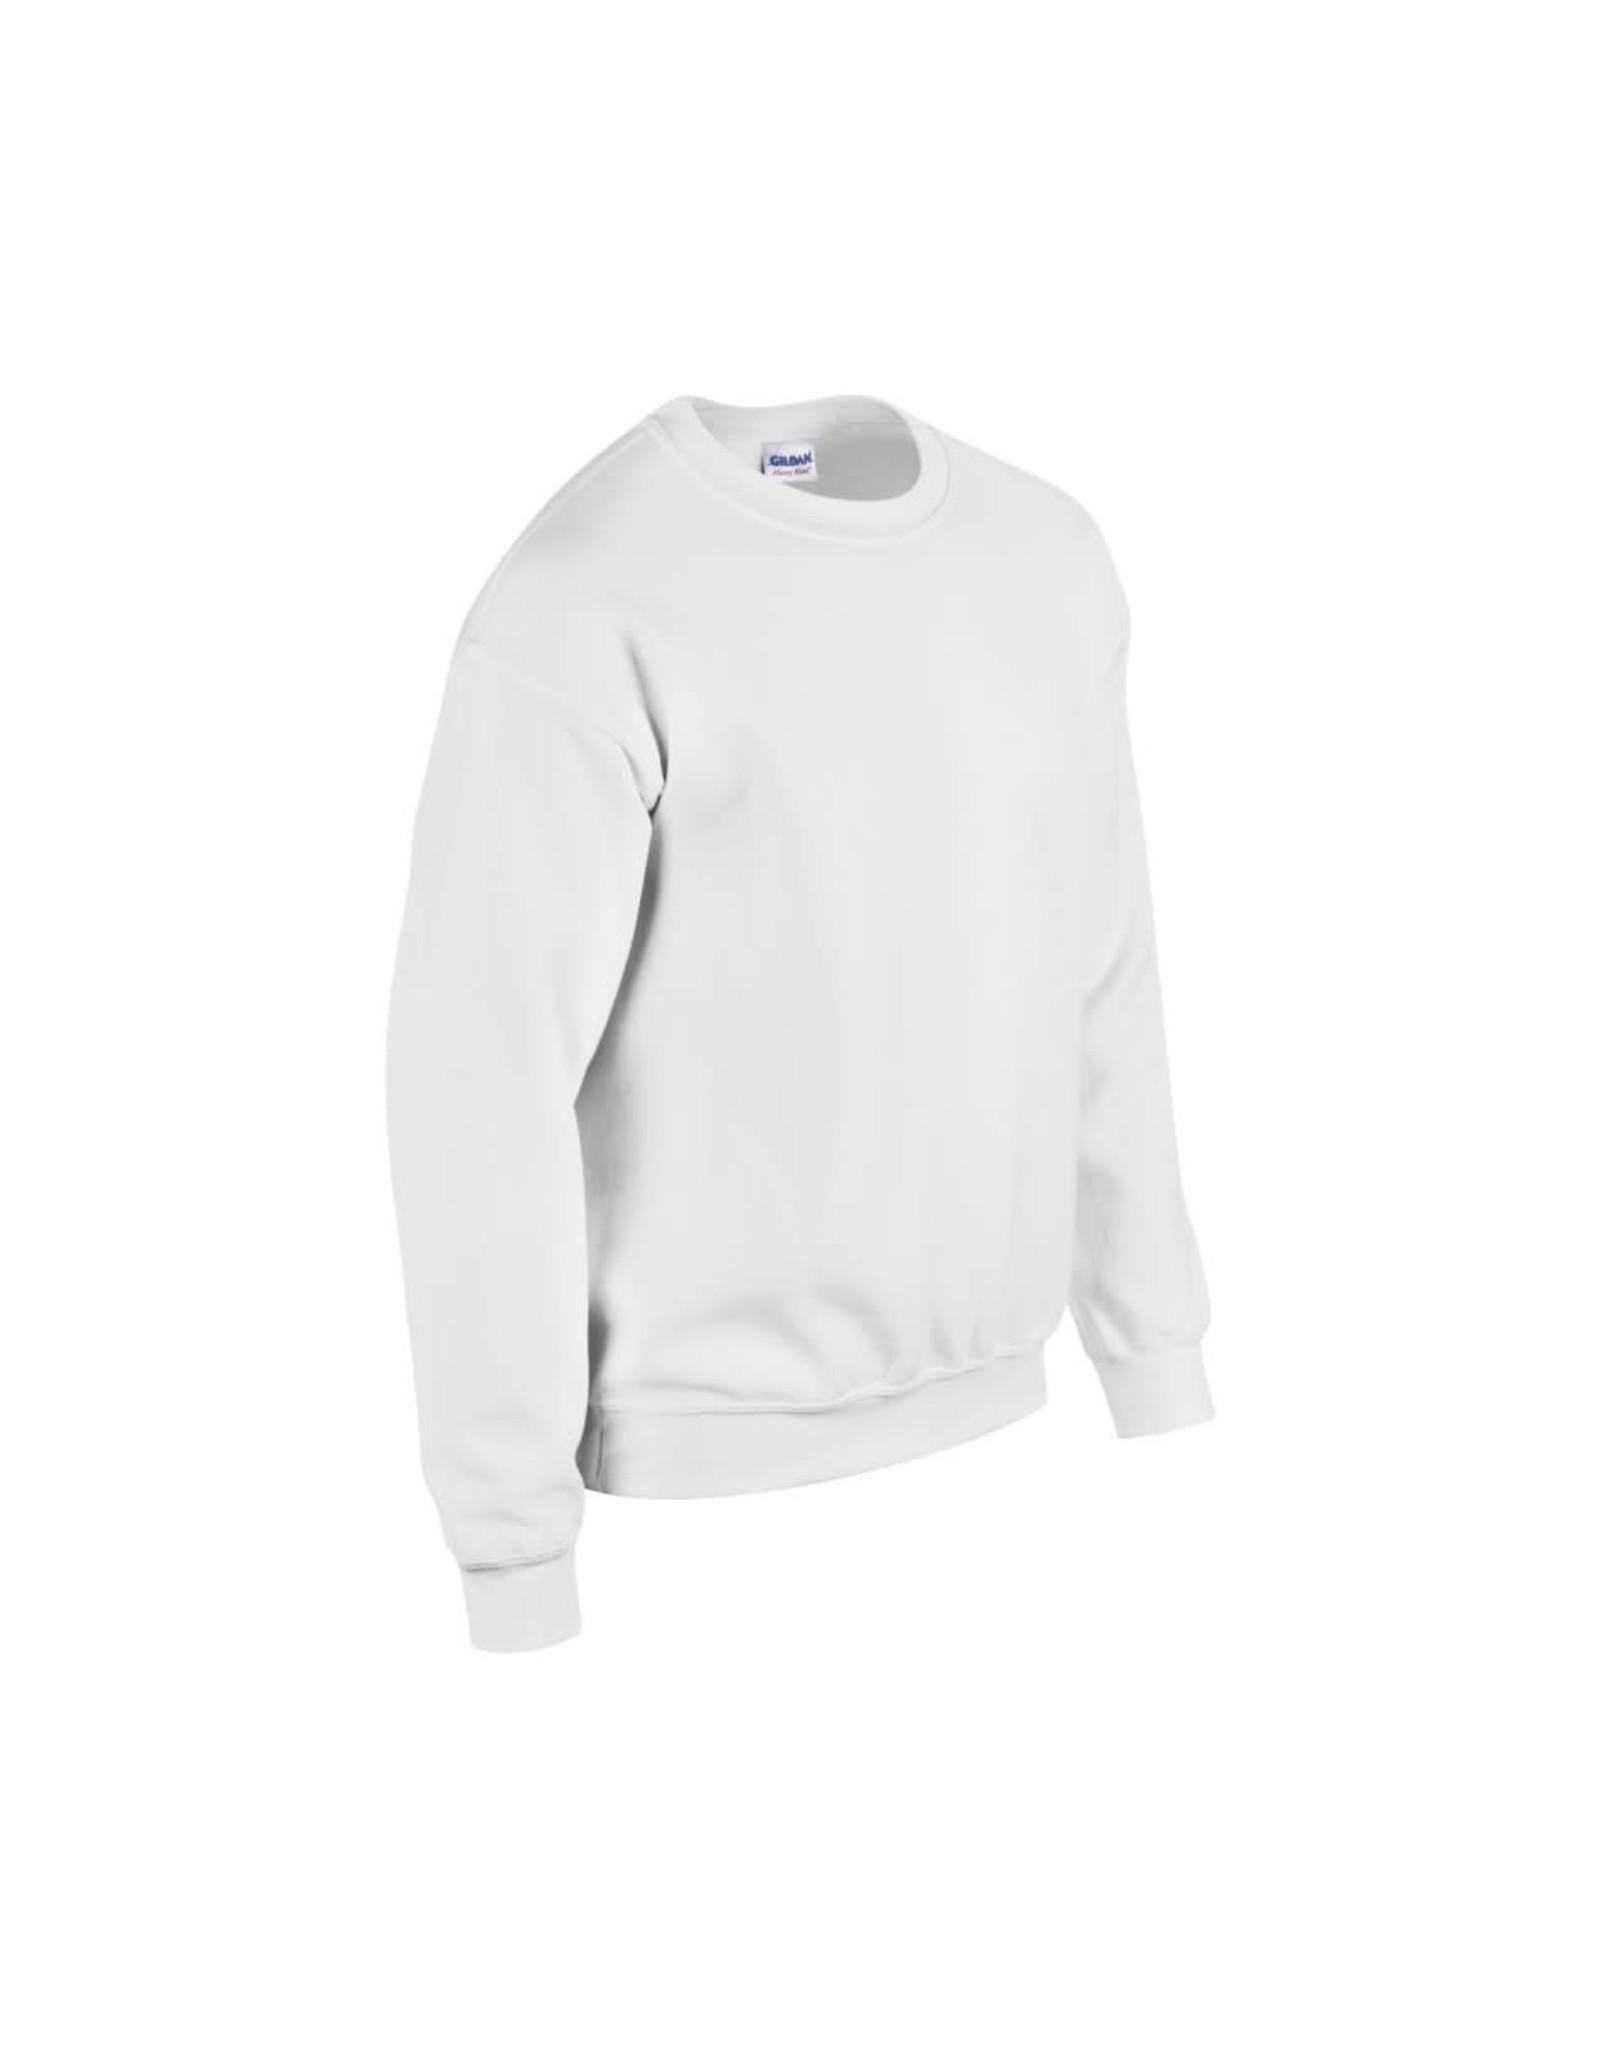 GILDAN Gildan Heavy Blend Crewneck Sweatshirt